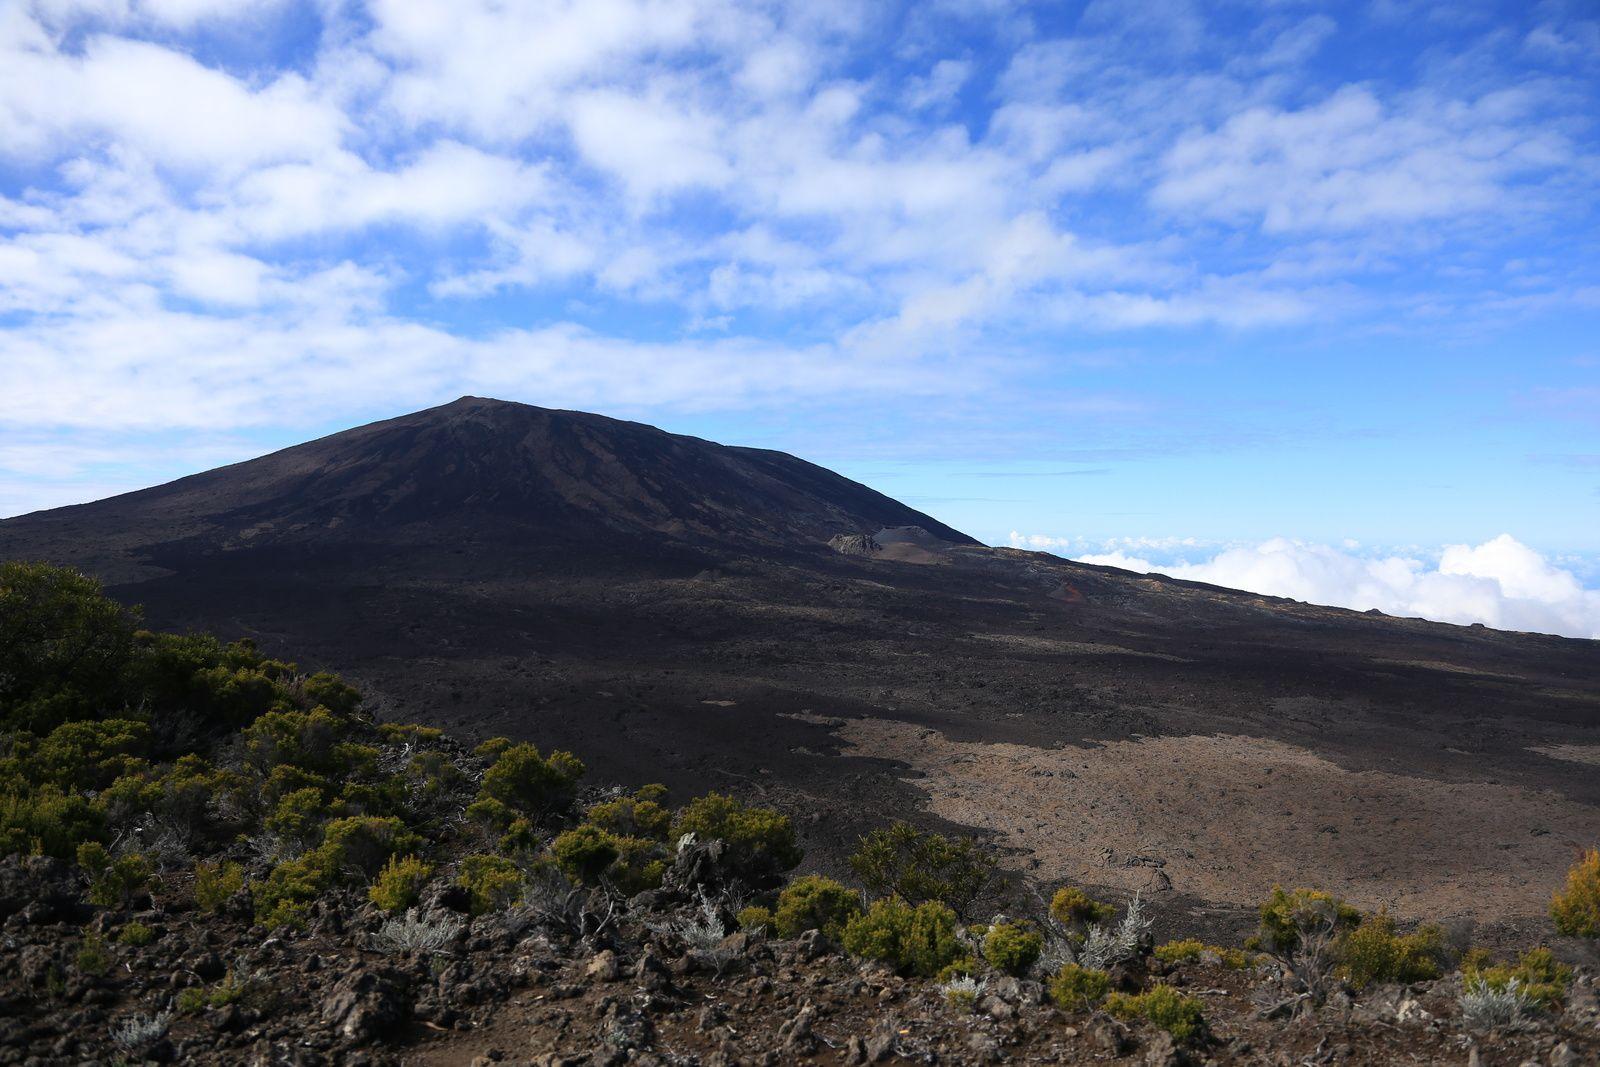 Piton de La Fournaise - Towards a next eruption, or not ? - photo © Bernard Duyck